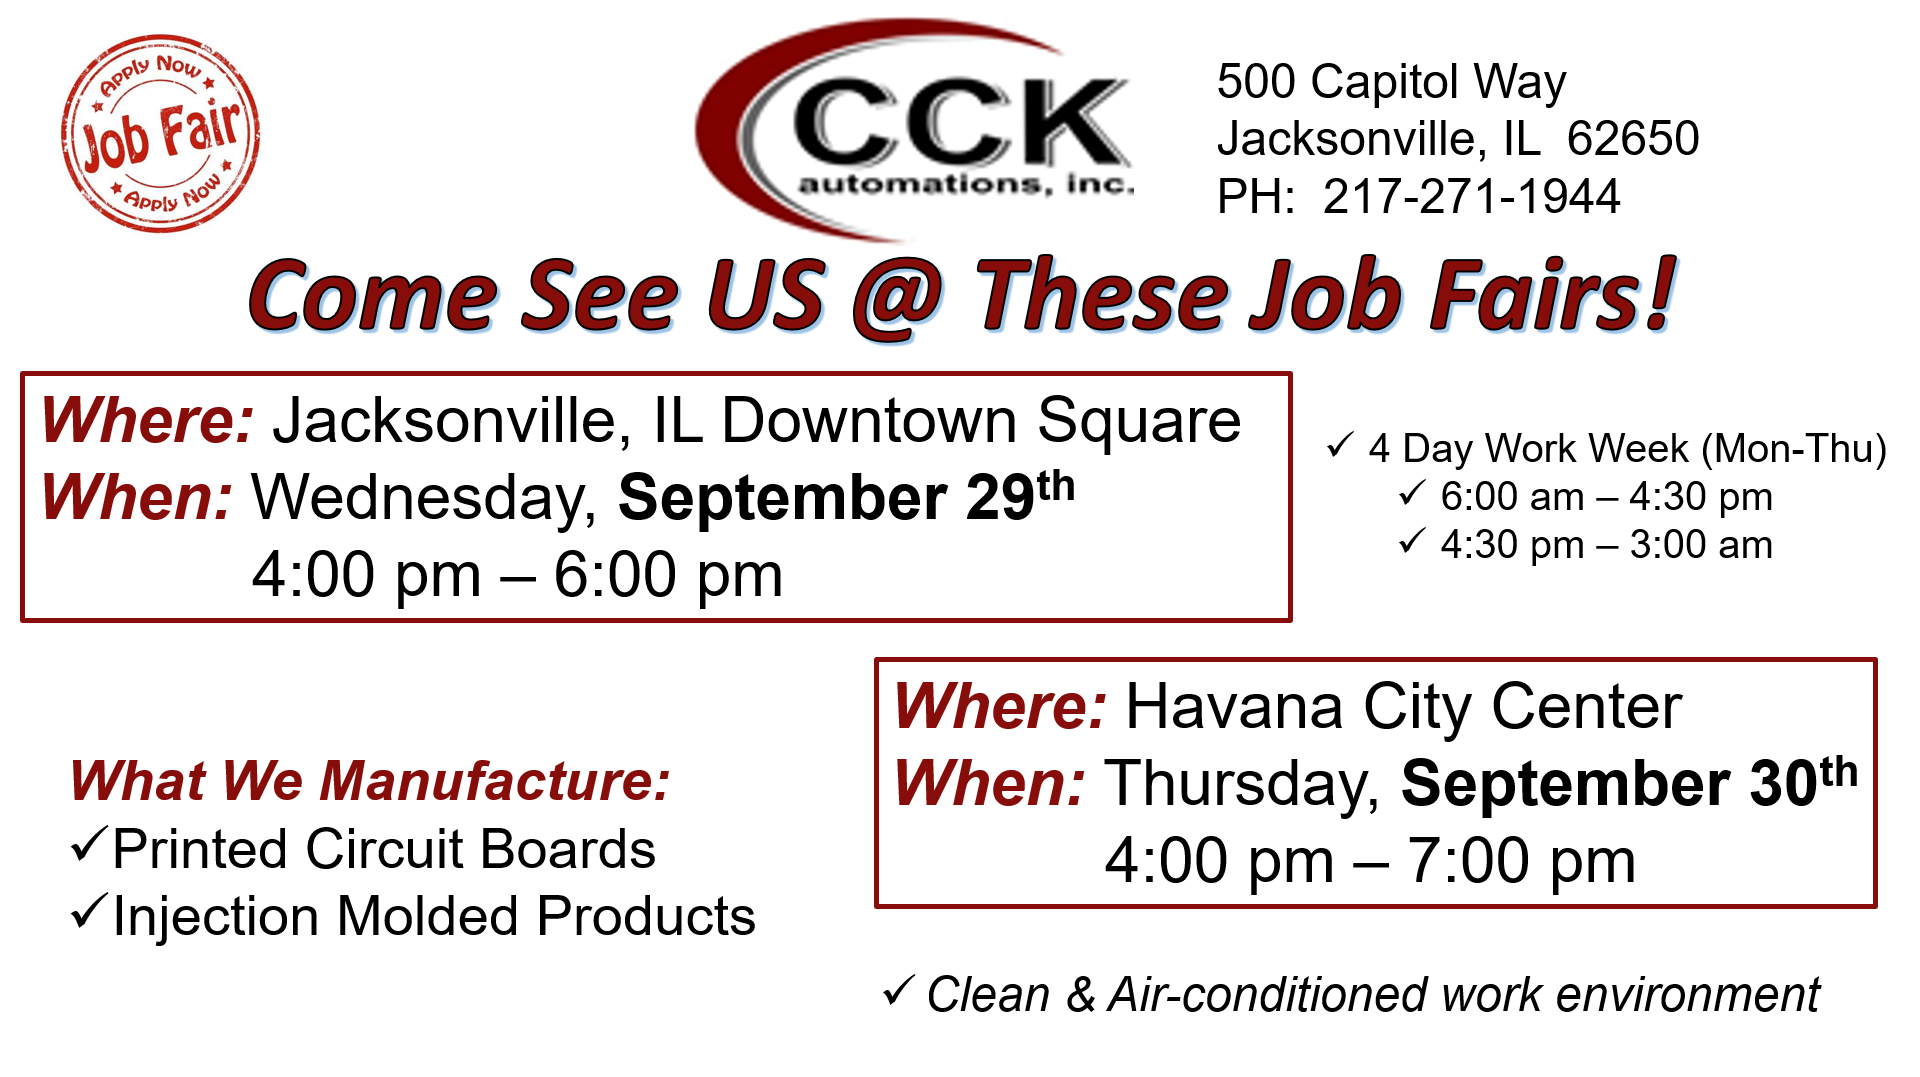 Job Fair Click to see details